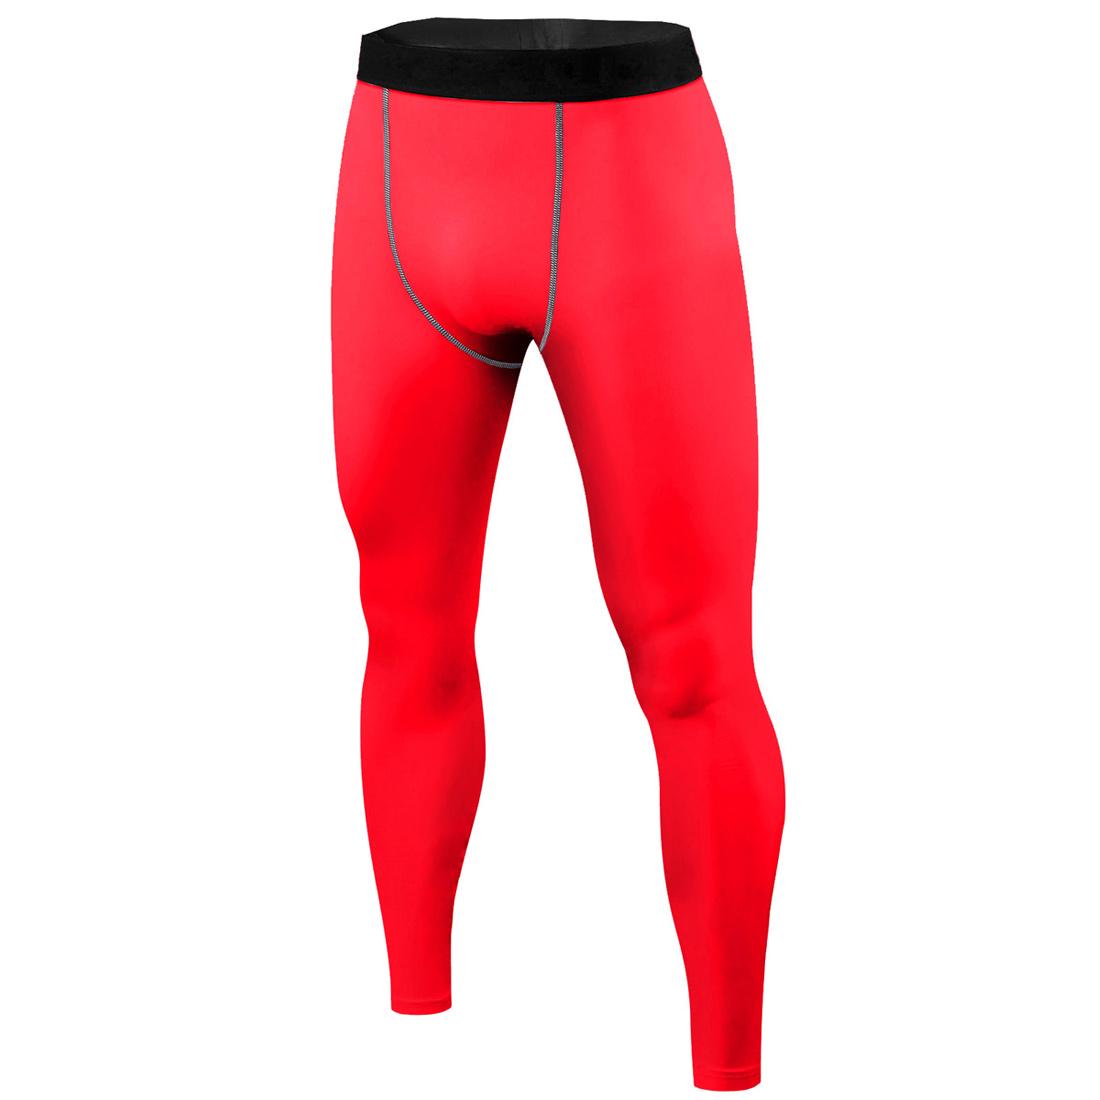 mens compression shorts 3 4 leggings long pants trousers. Black Bedroom Furniture Sets. Home Design Ideas